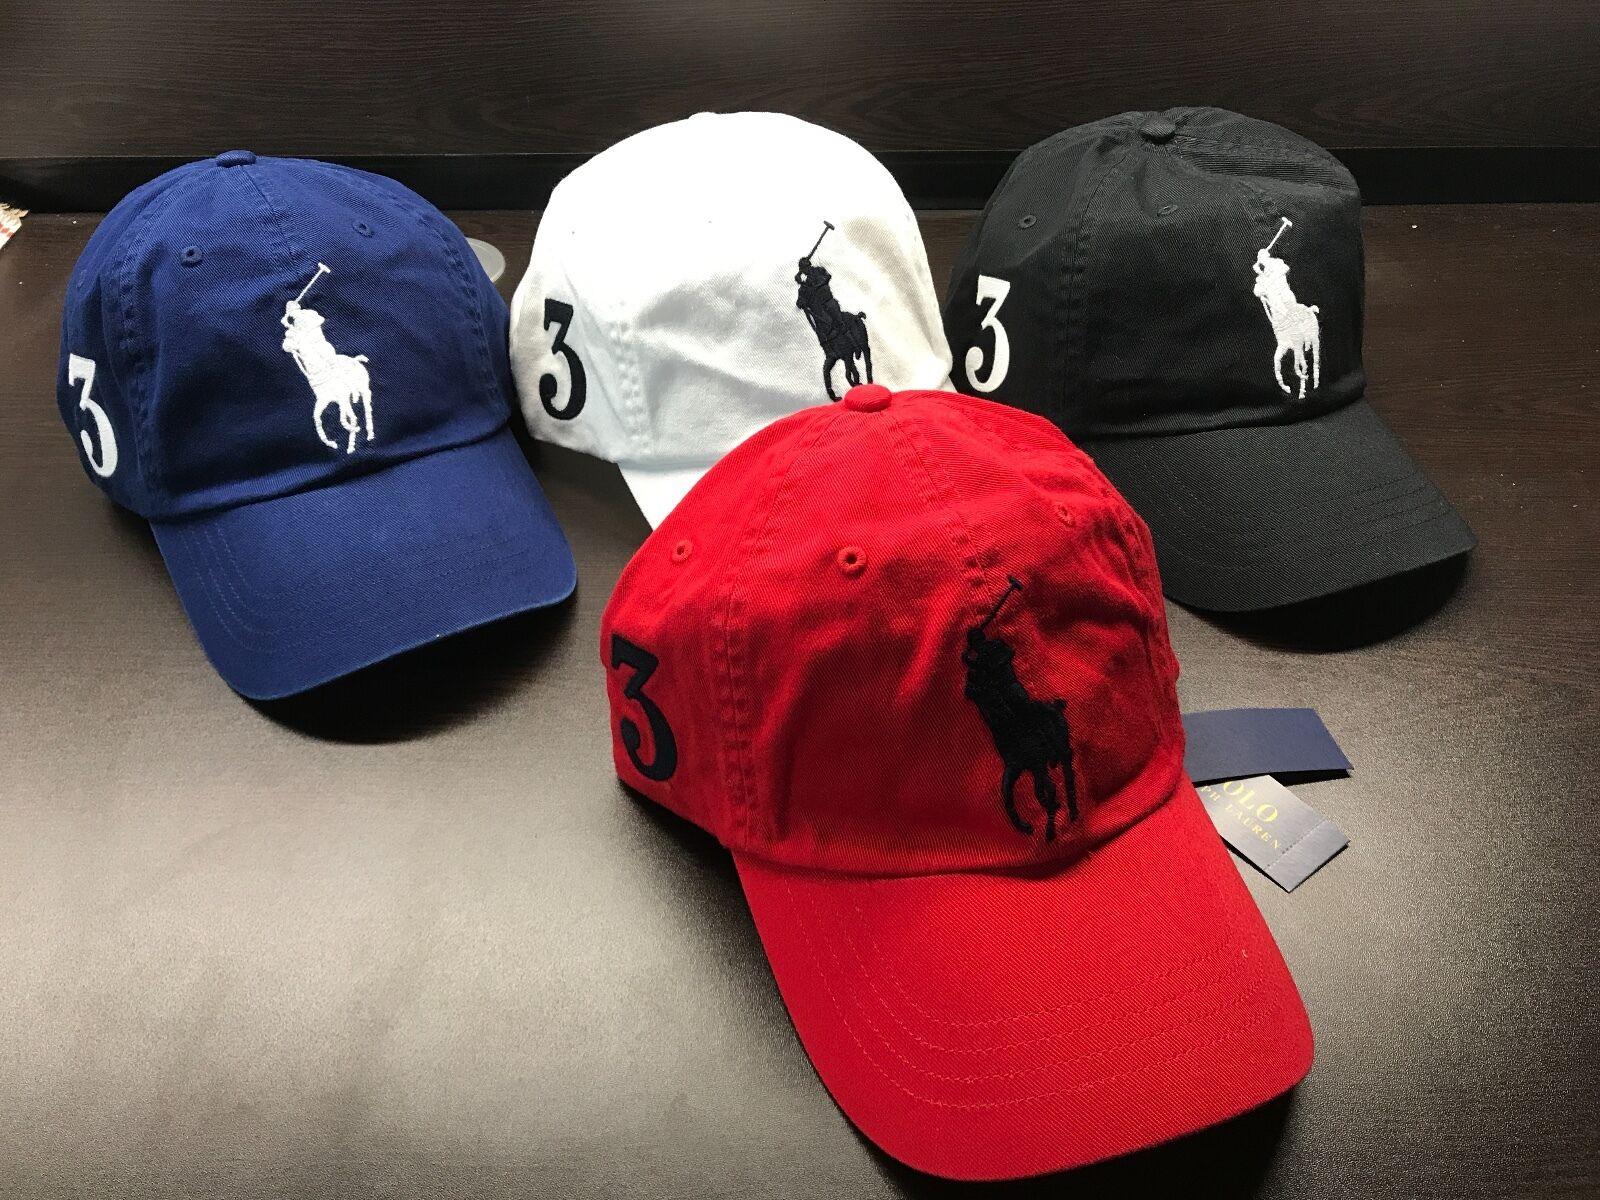 NEW Polo Ralph Lauren Baseball Cap Hat Big Pony Adjustable L